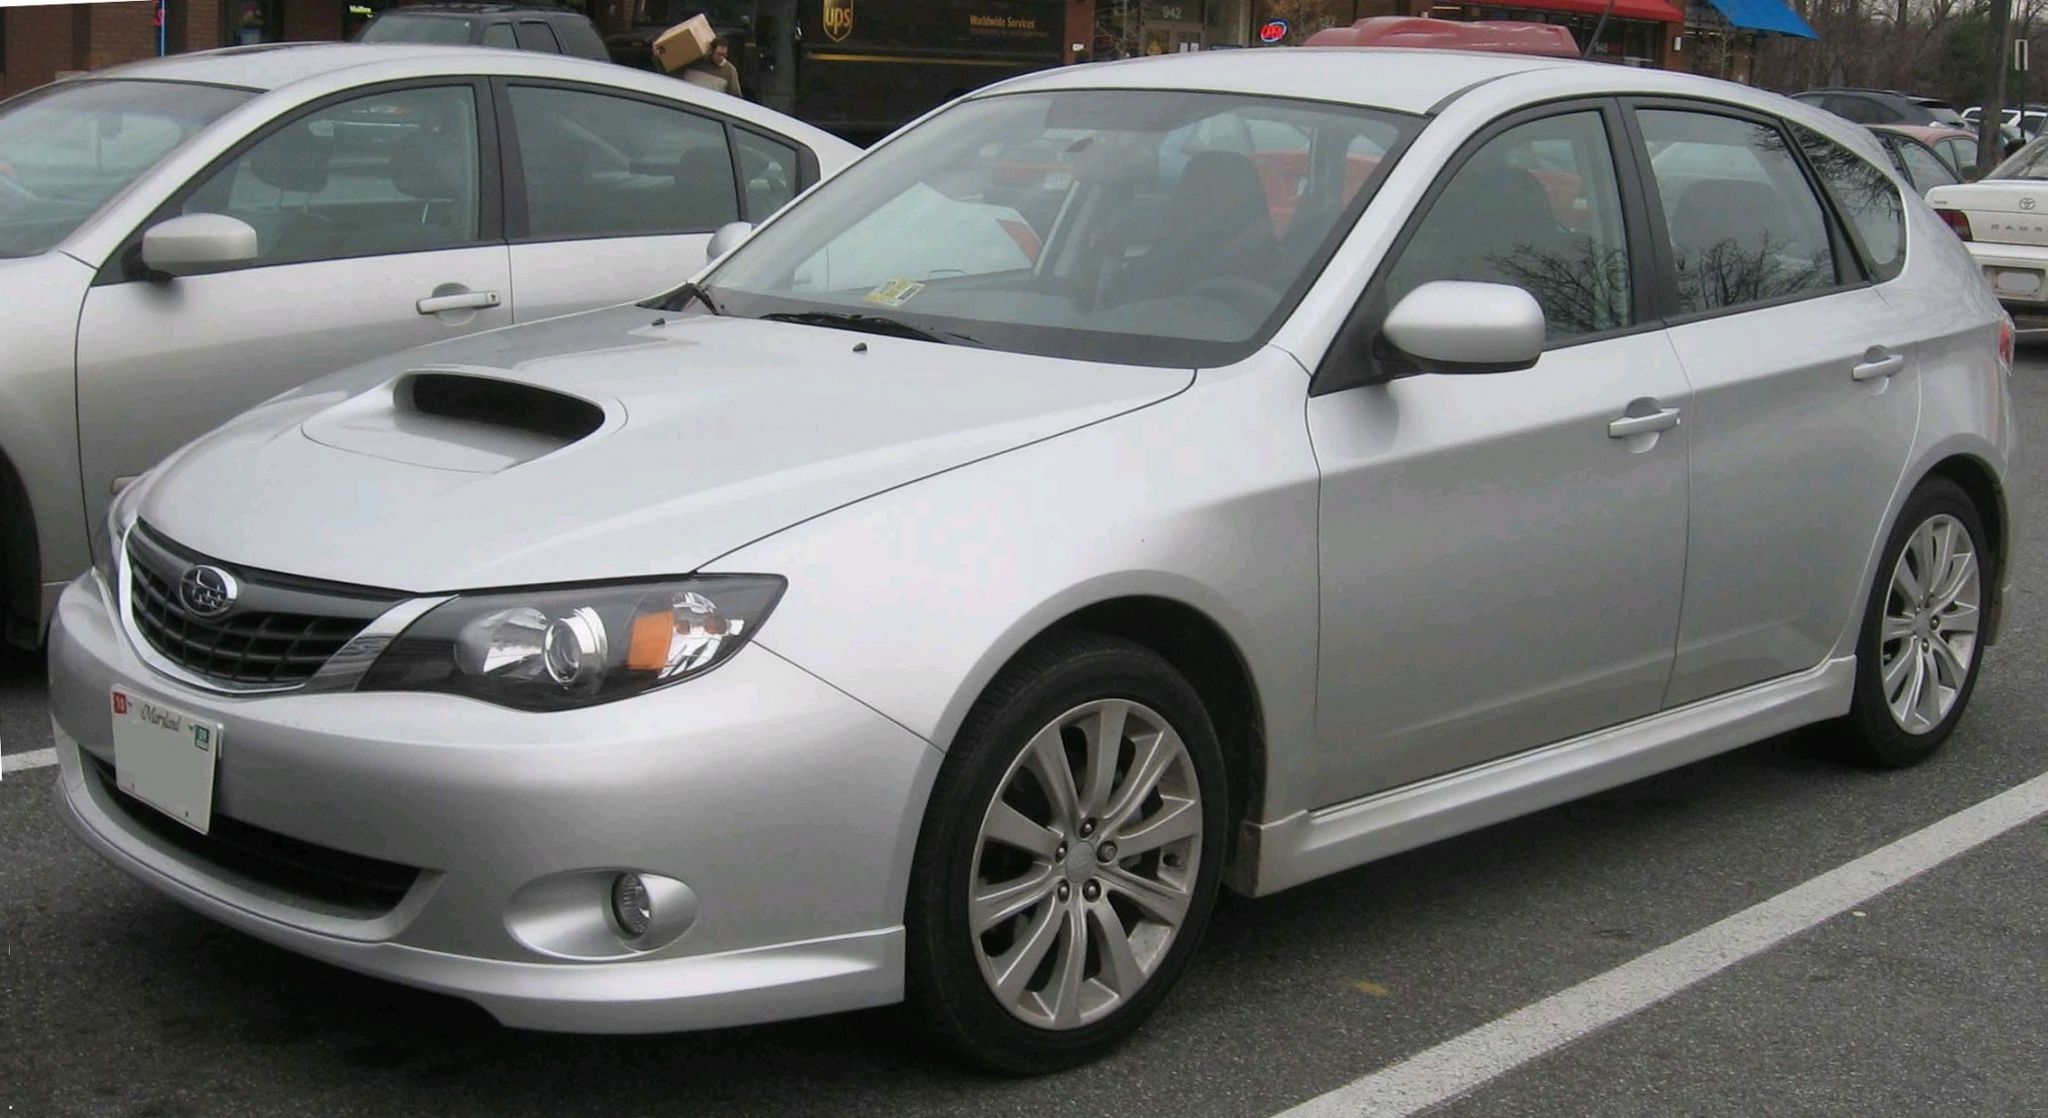 2048x1118 Subaru Free Screensaver Wallpapers Sports Cars For